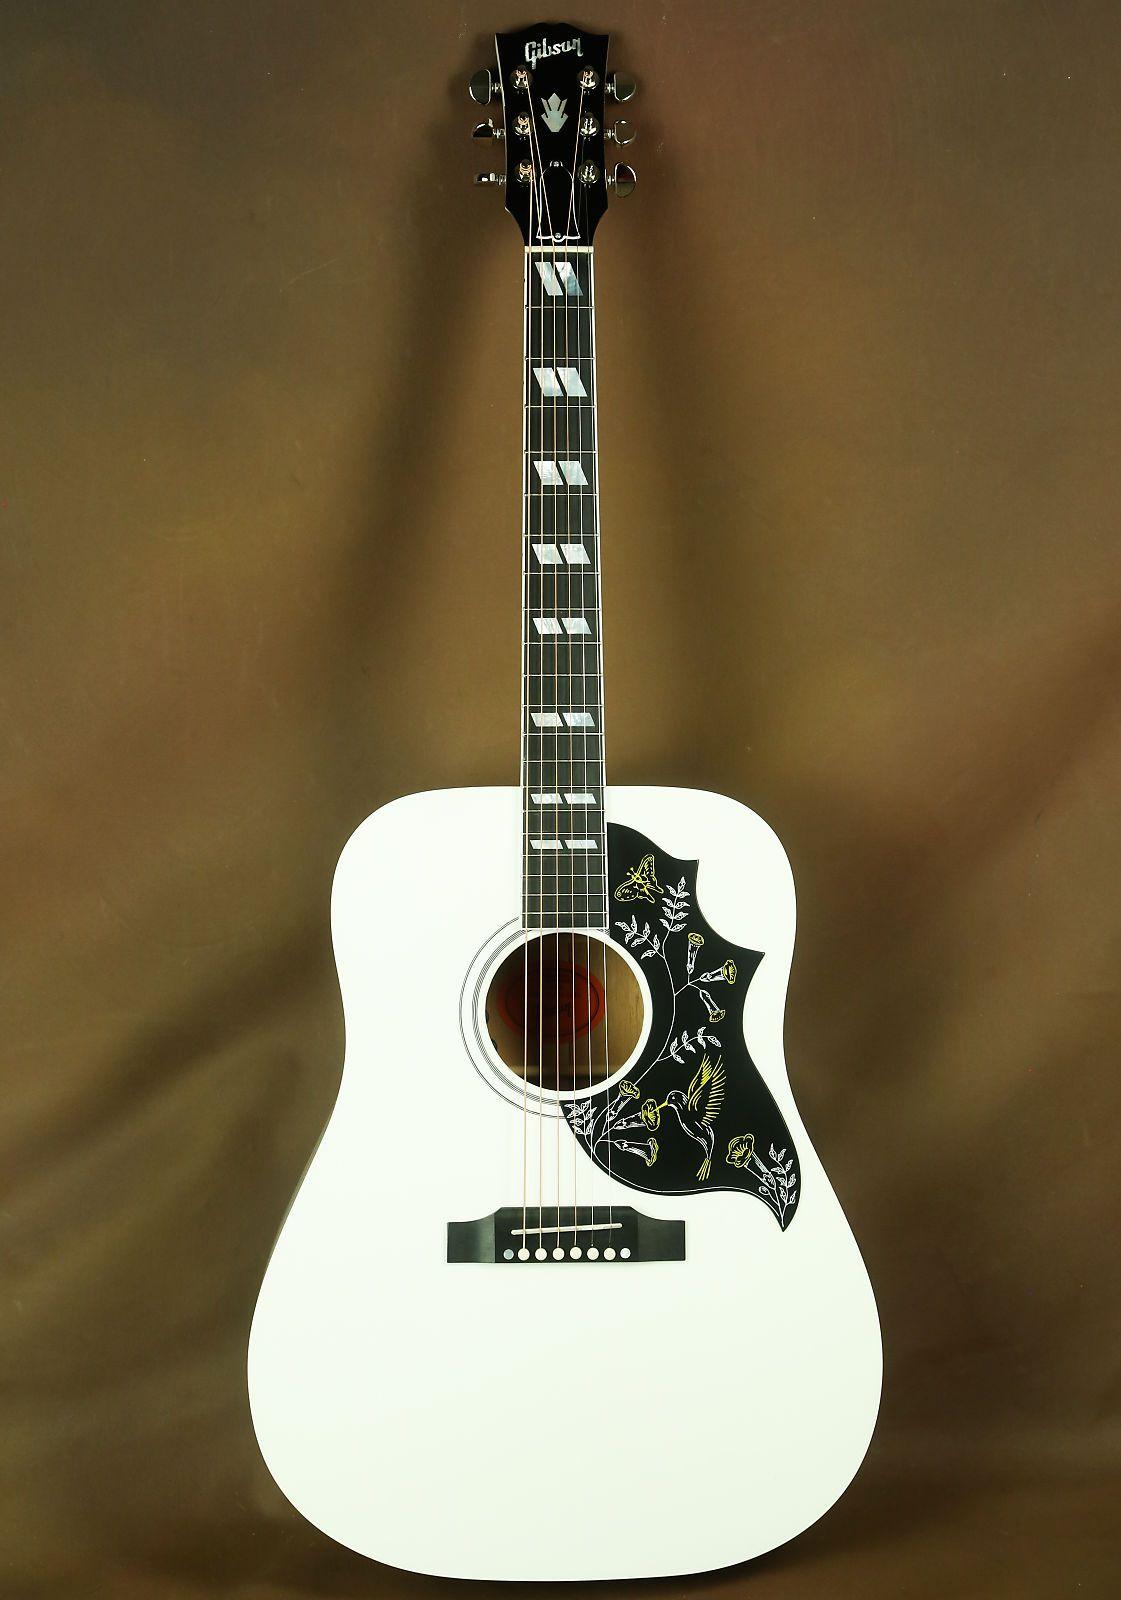 Gibson Hummingbird Alpine White Acoustic Guitar Rare Acoustic Guitar Guitar Gibson Acoustic